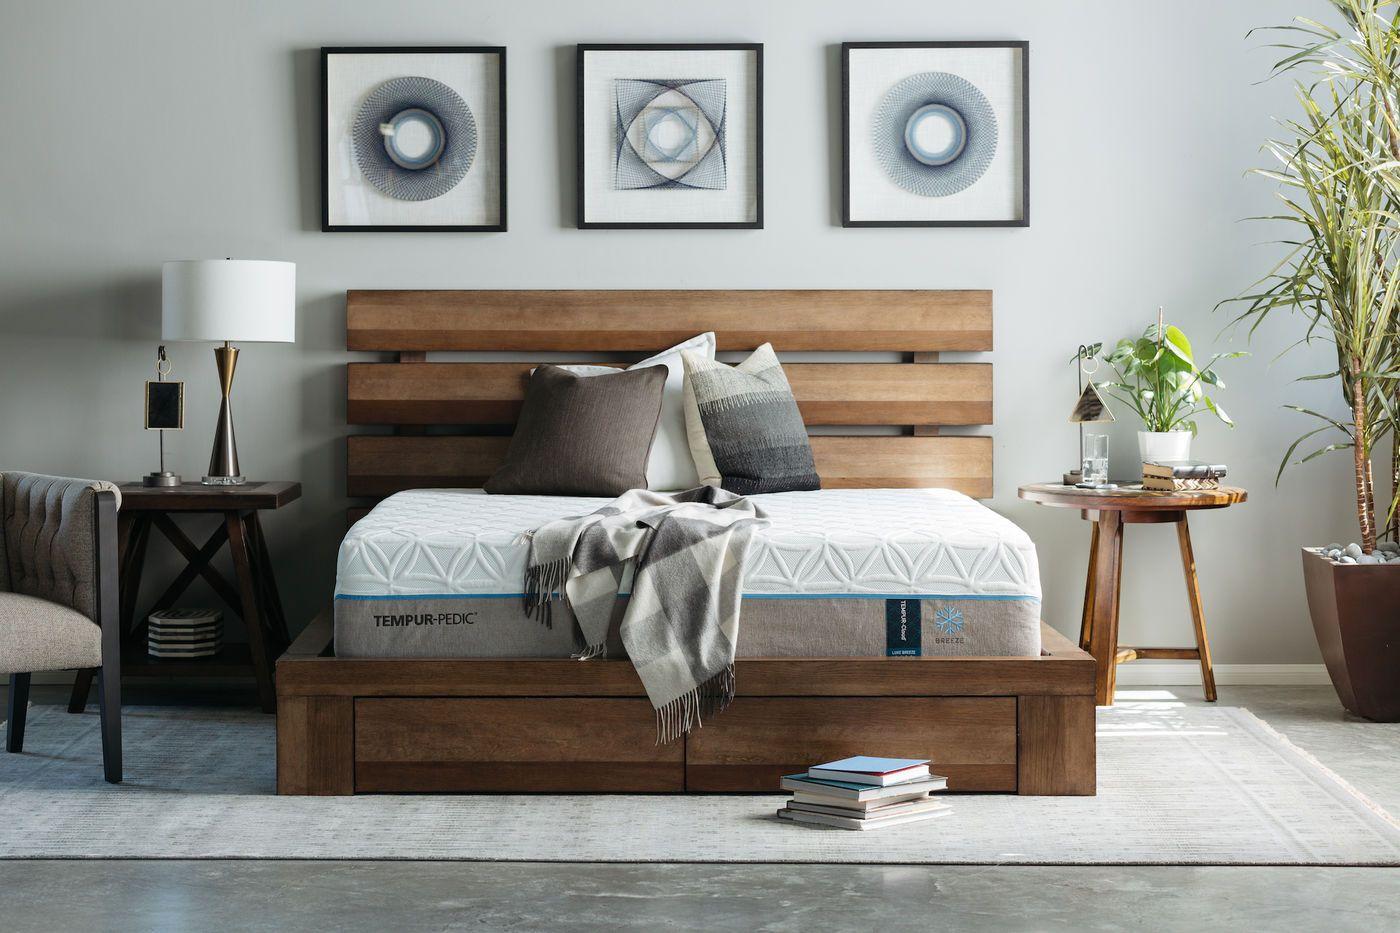 MidCentury Modern Planked Storage Bed in Brown Mathis